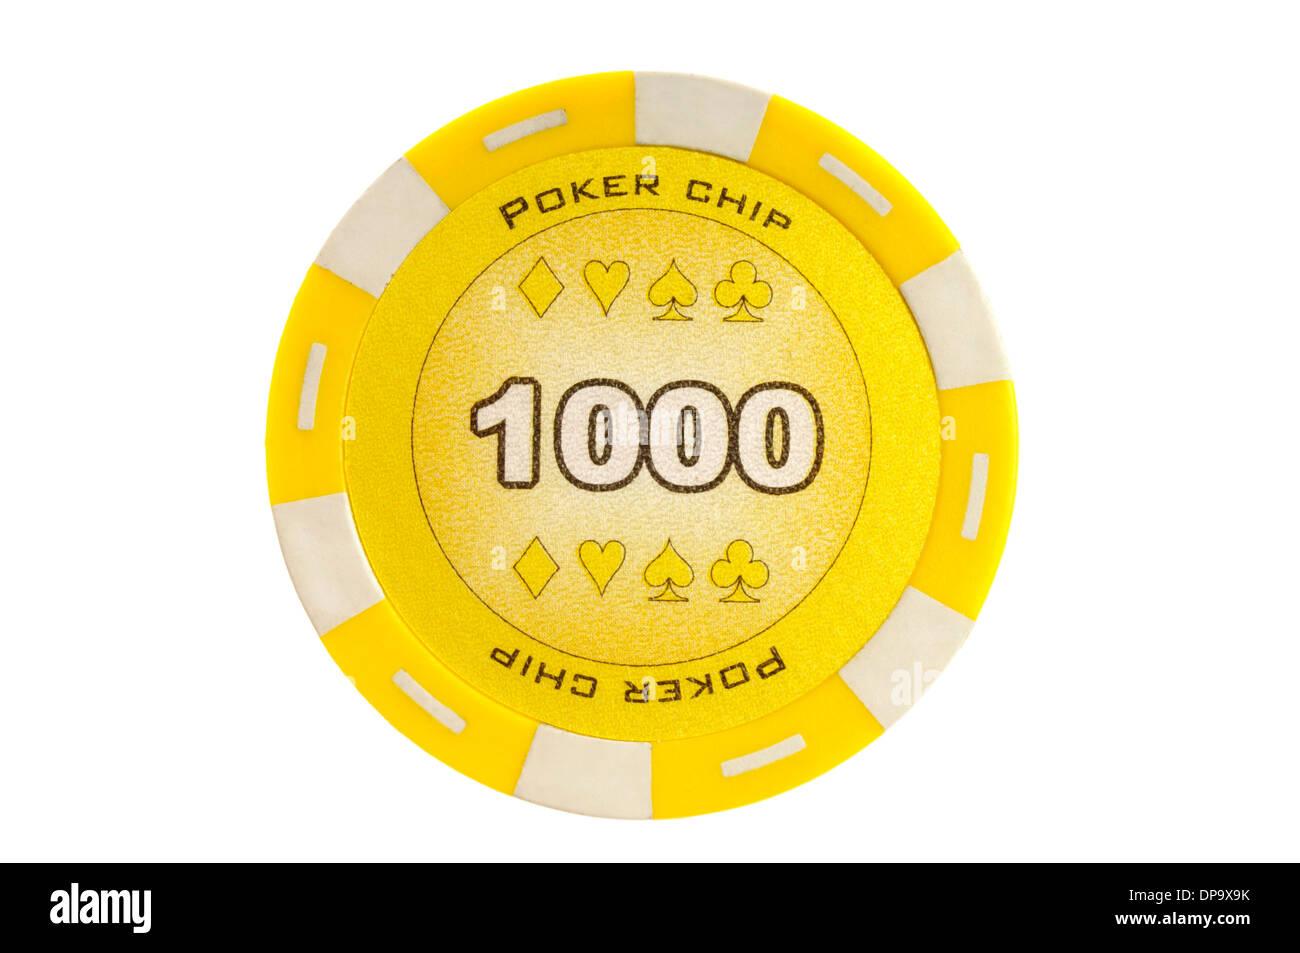 Pokerchip Stockfoto, Bild: 65371759 - Alamy